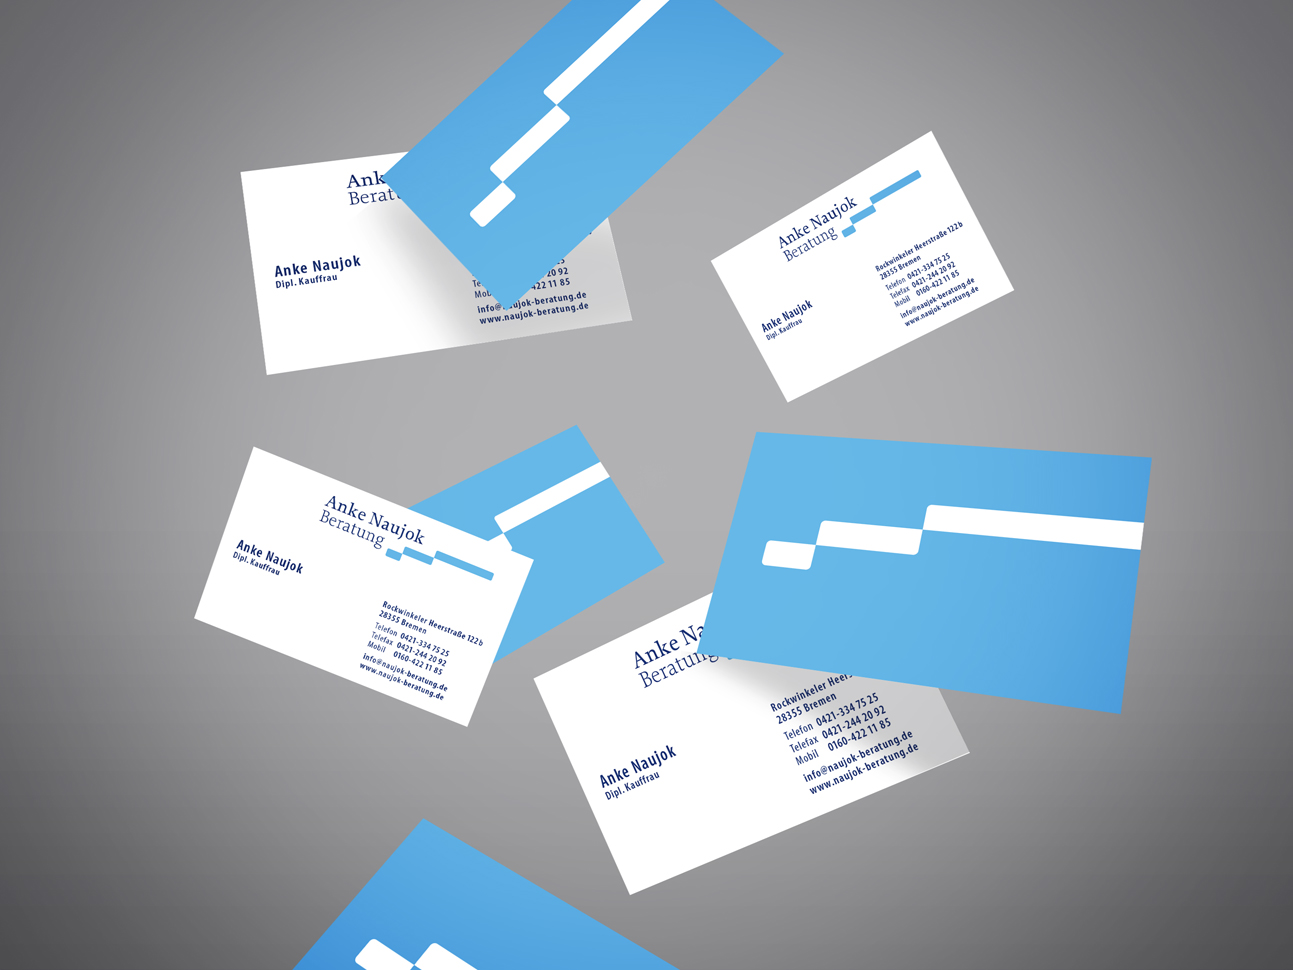 martin_zech_design_corporate_design_anke_naujok_beratung_visitenkarte